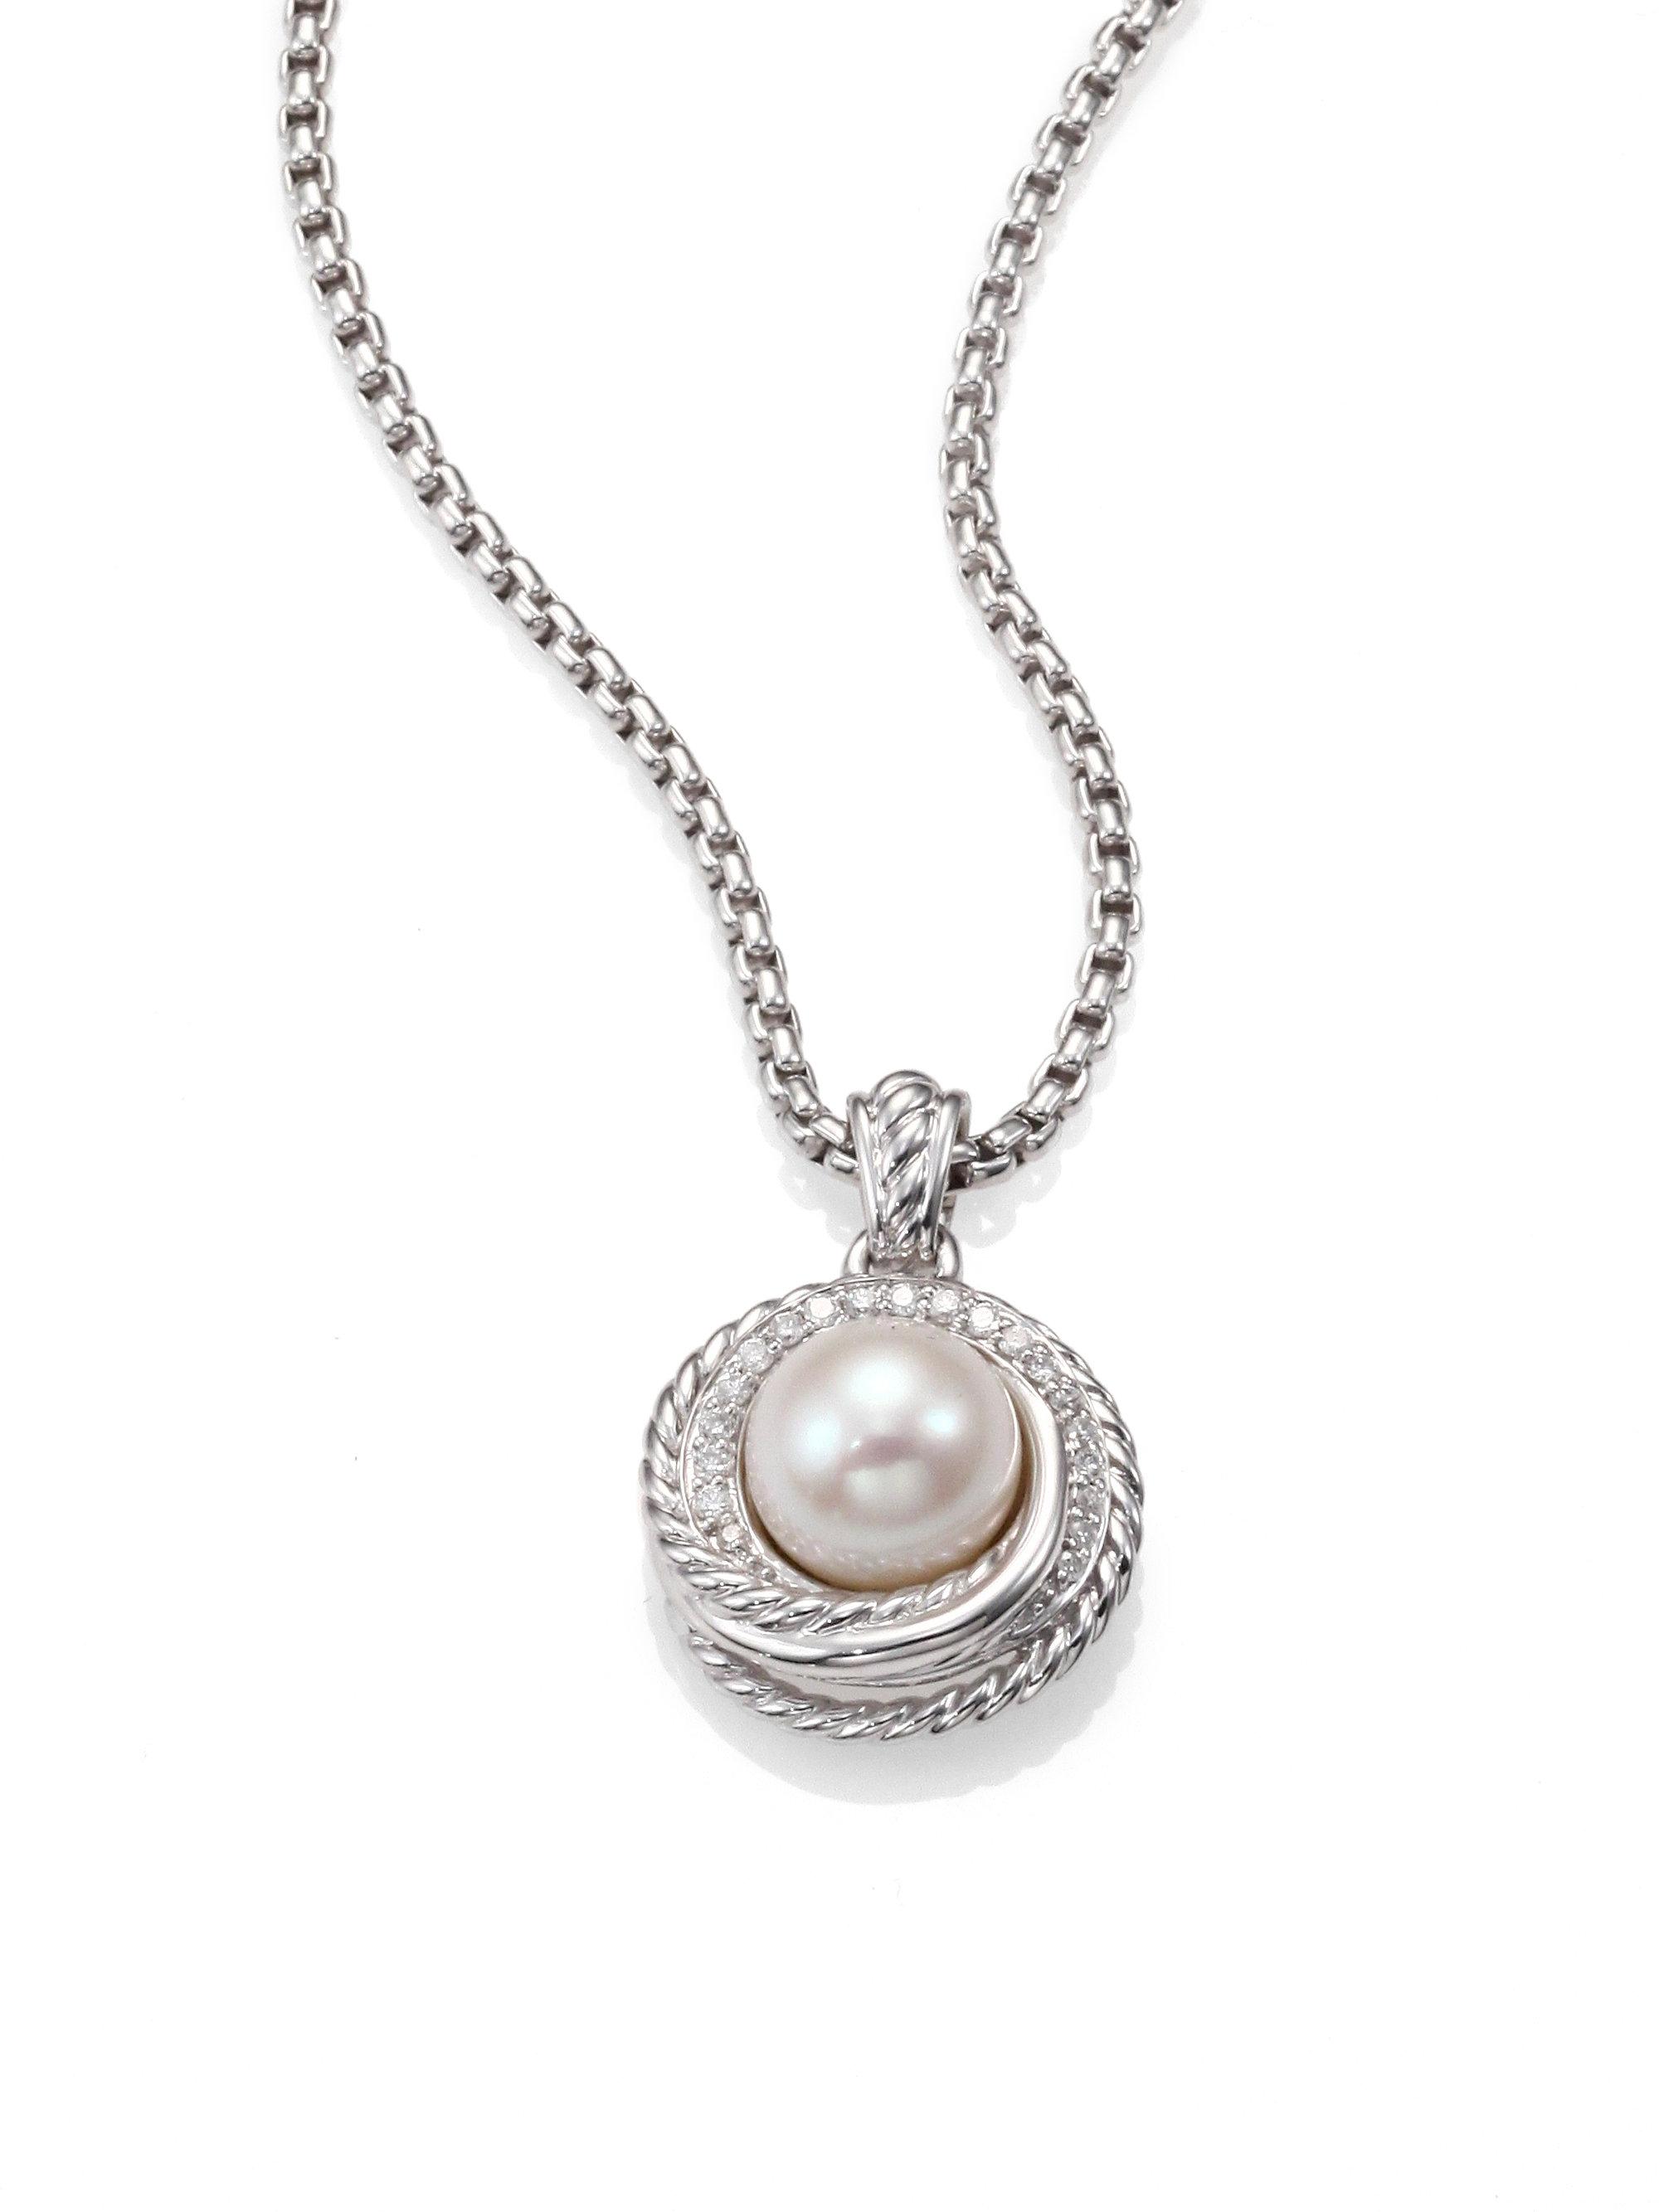 david yurman pearl diamond sterling silver pendant. Black Bedroom Furniture Sets. Home Design Ideas